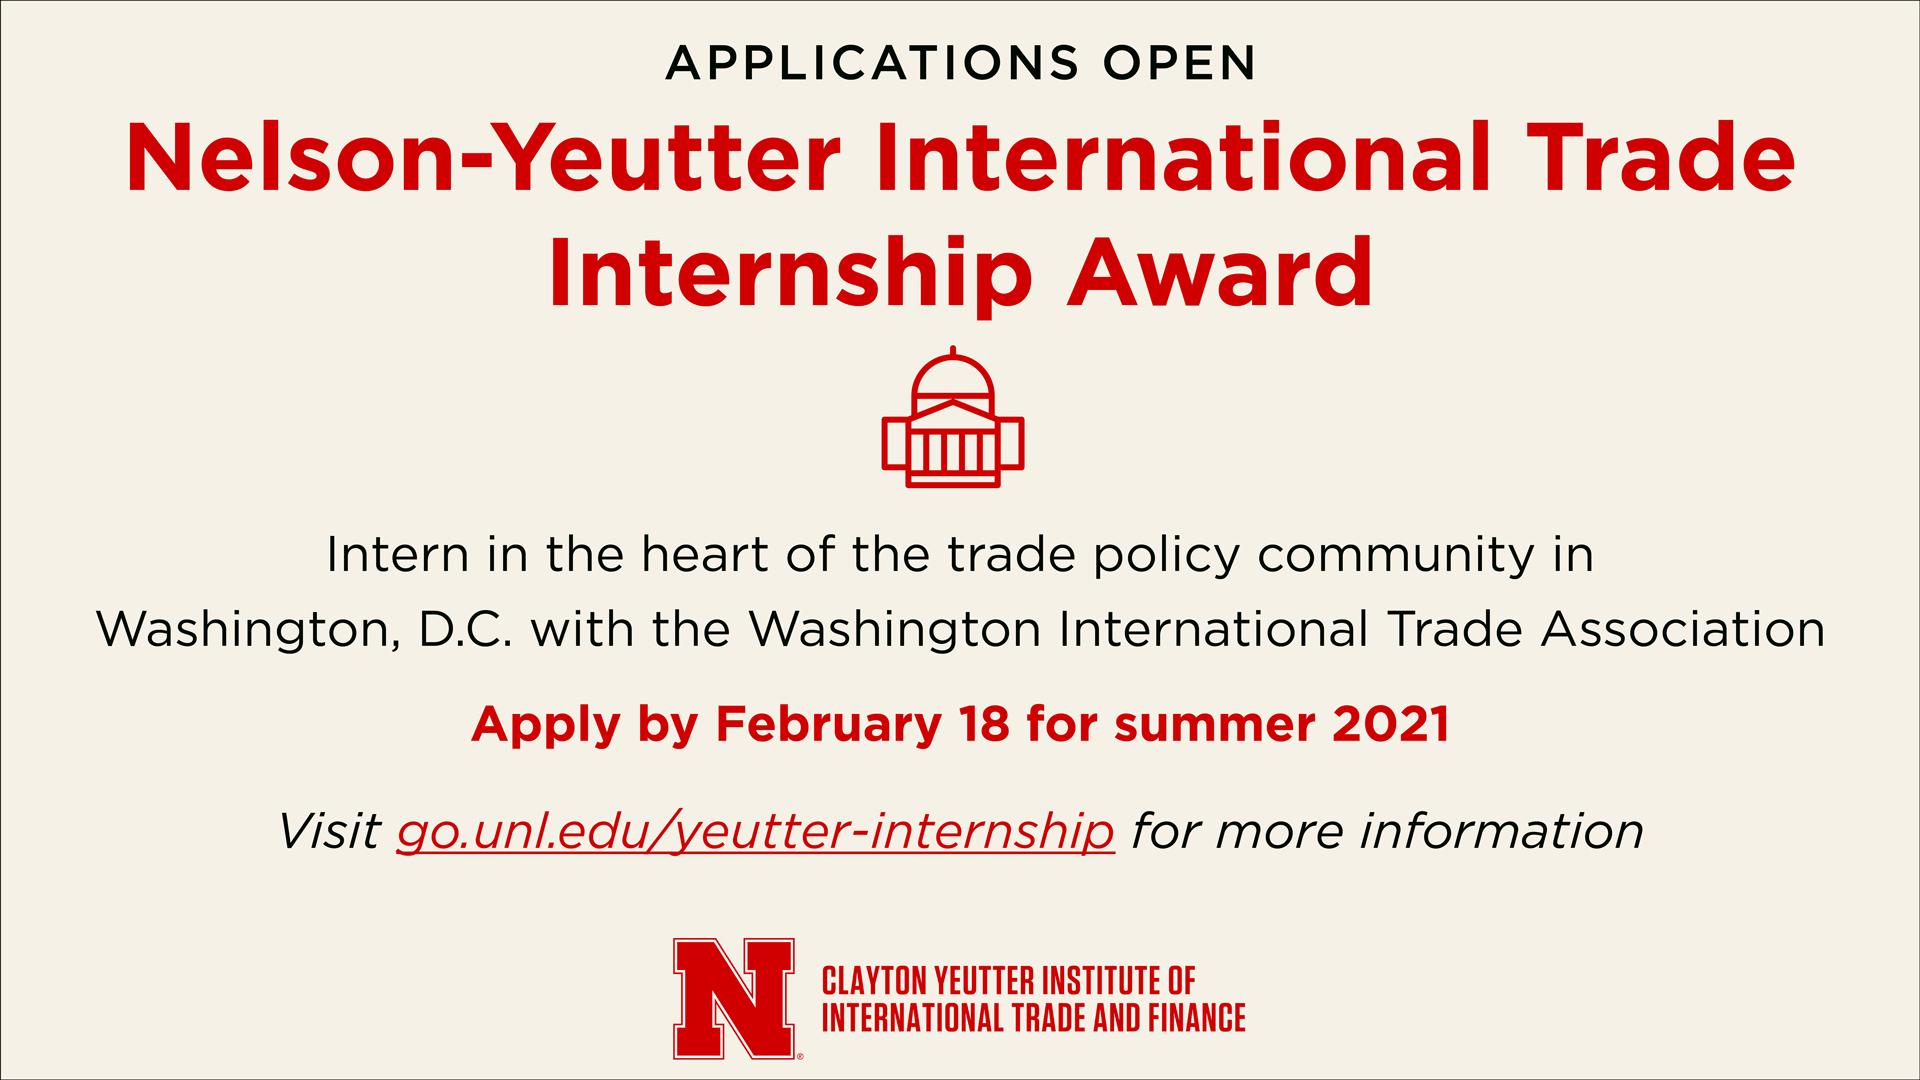 Nelson-Yeutter International Trade Internship Award applications are due Feb. 18.